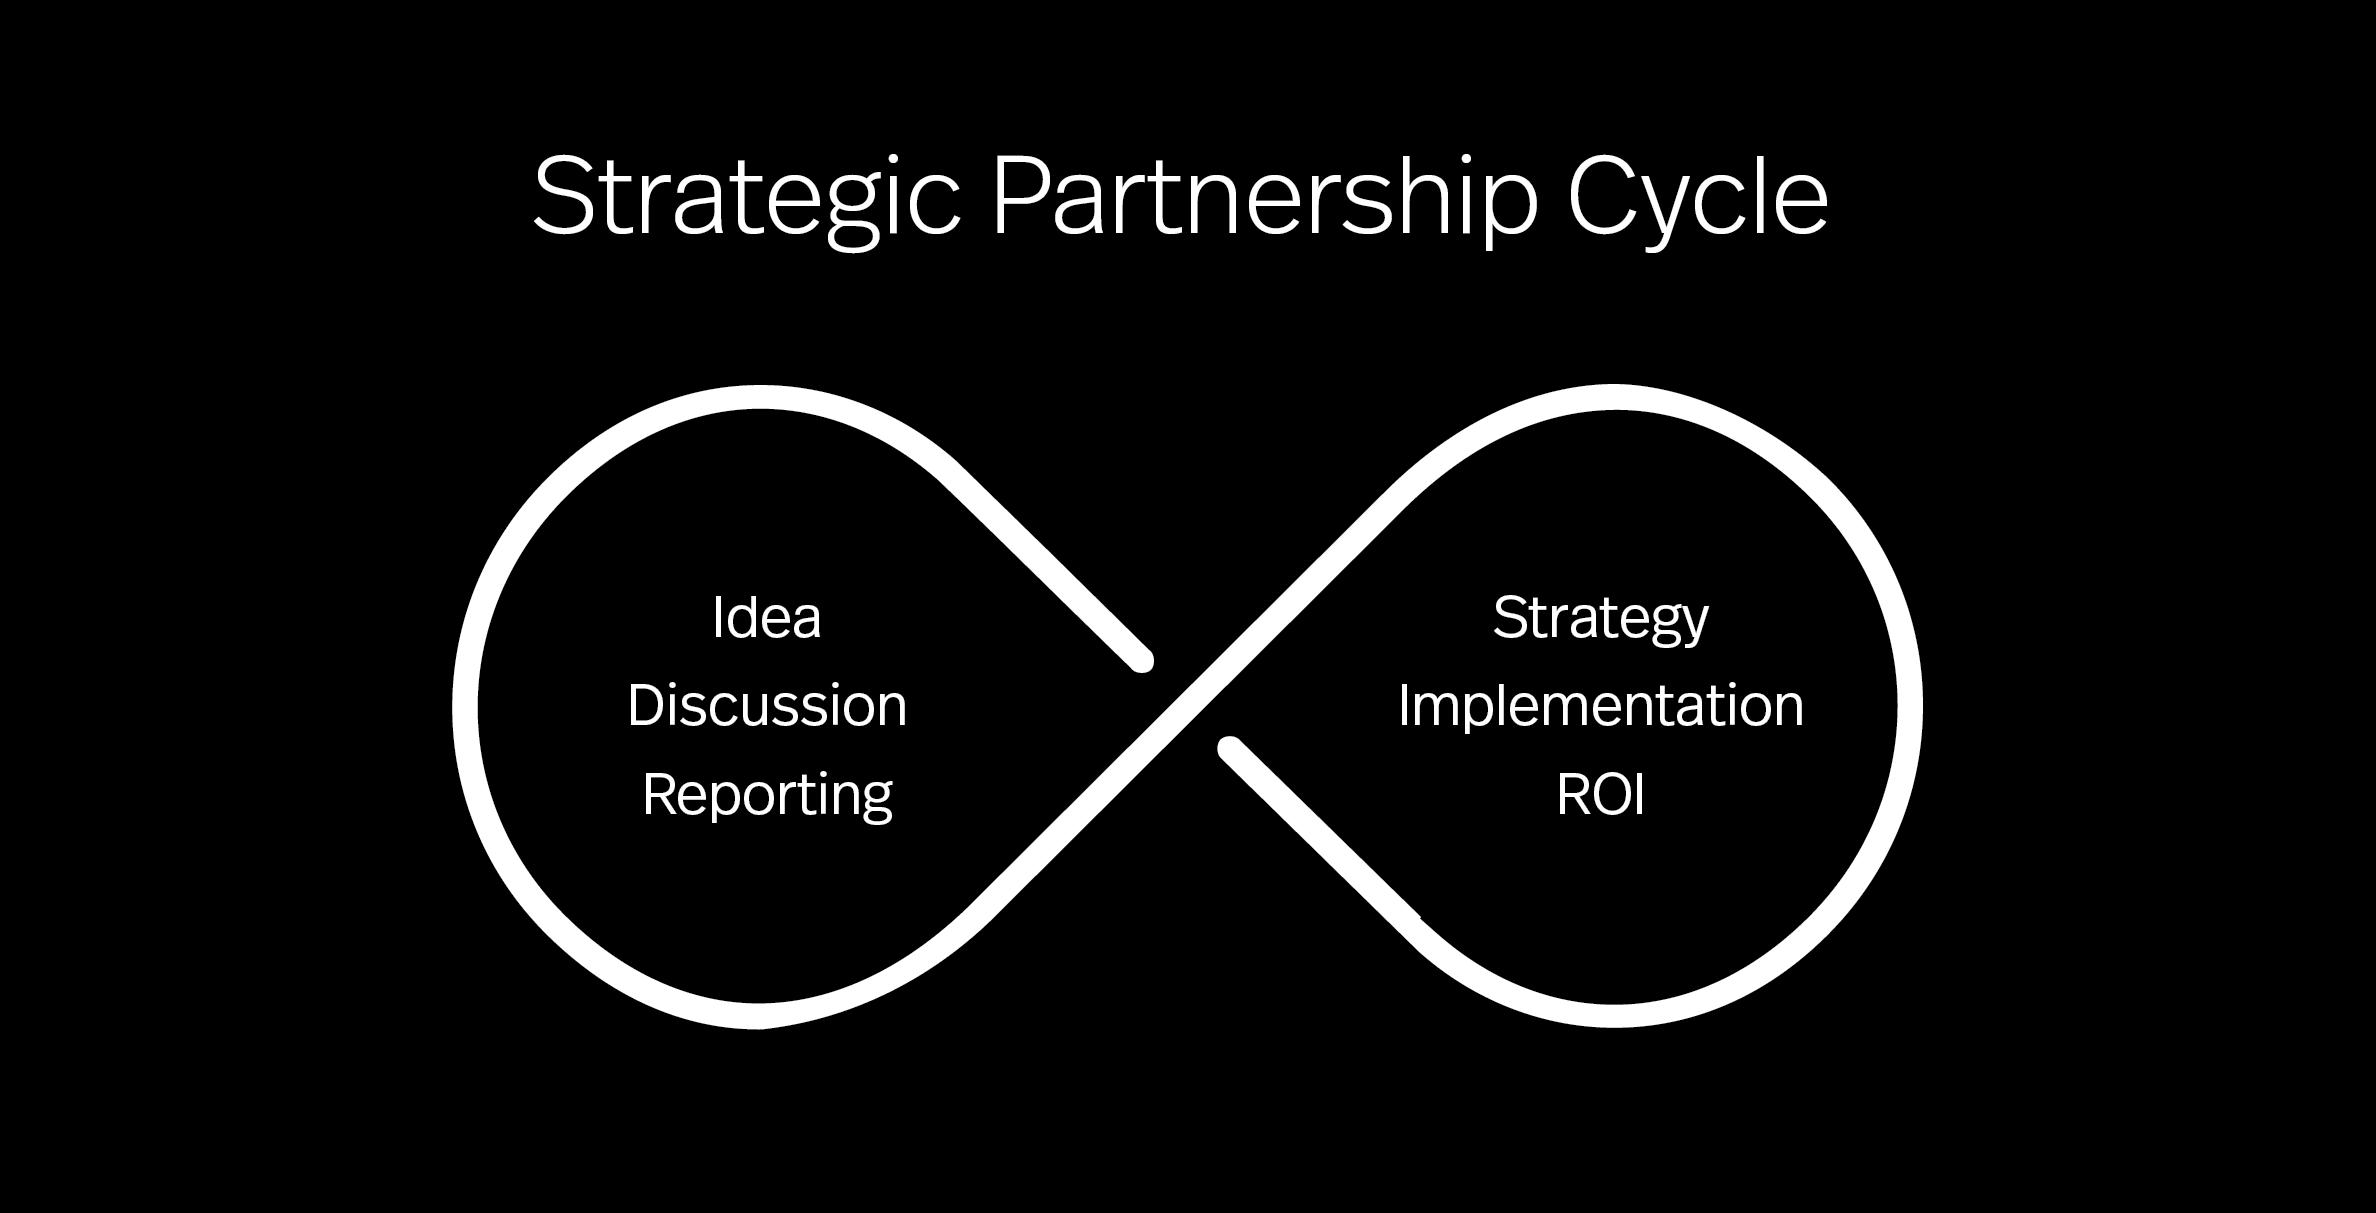 Strategic Partnership Cycle Graphic